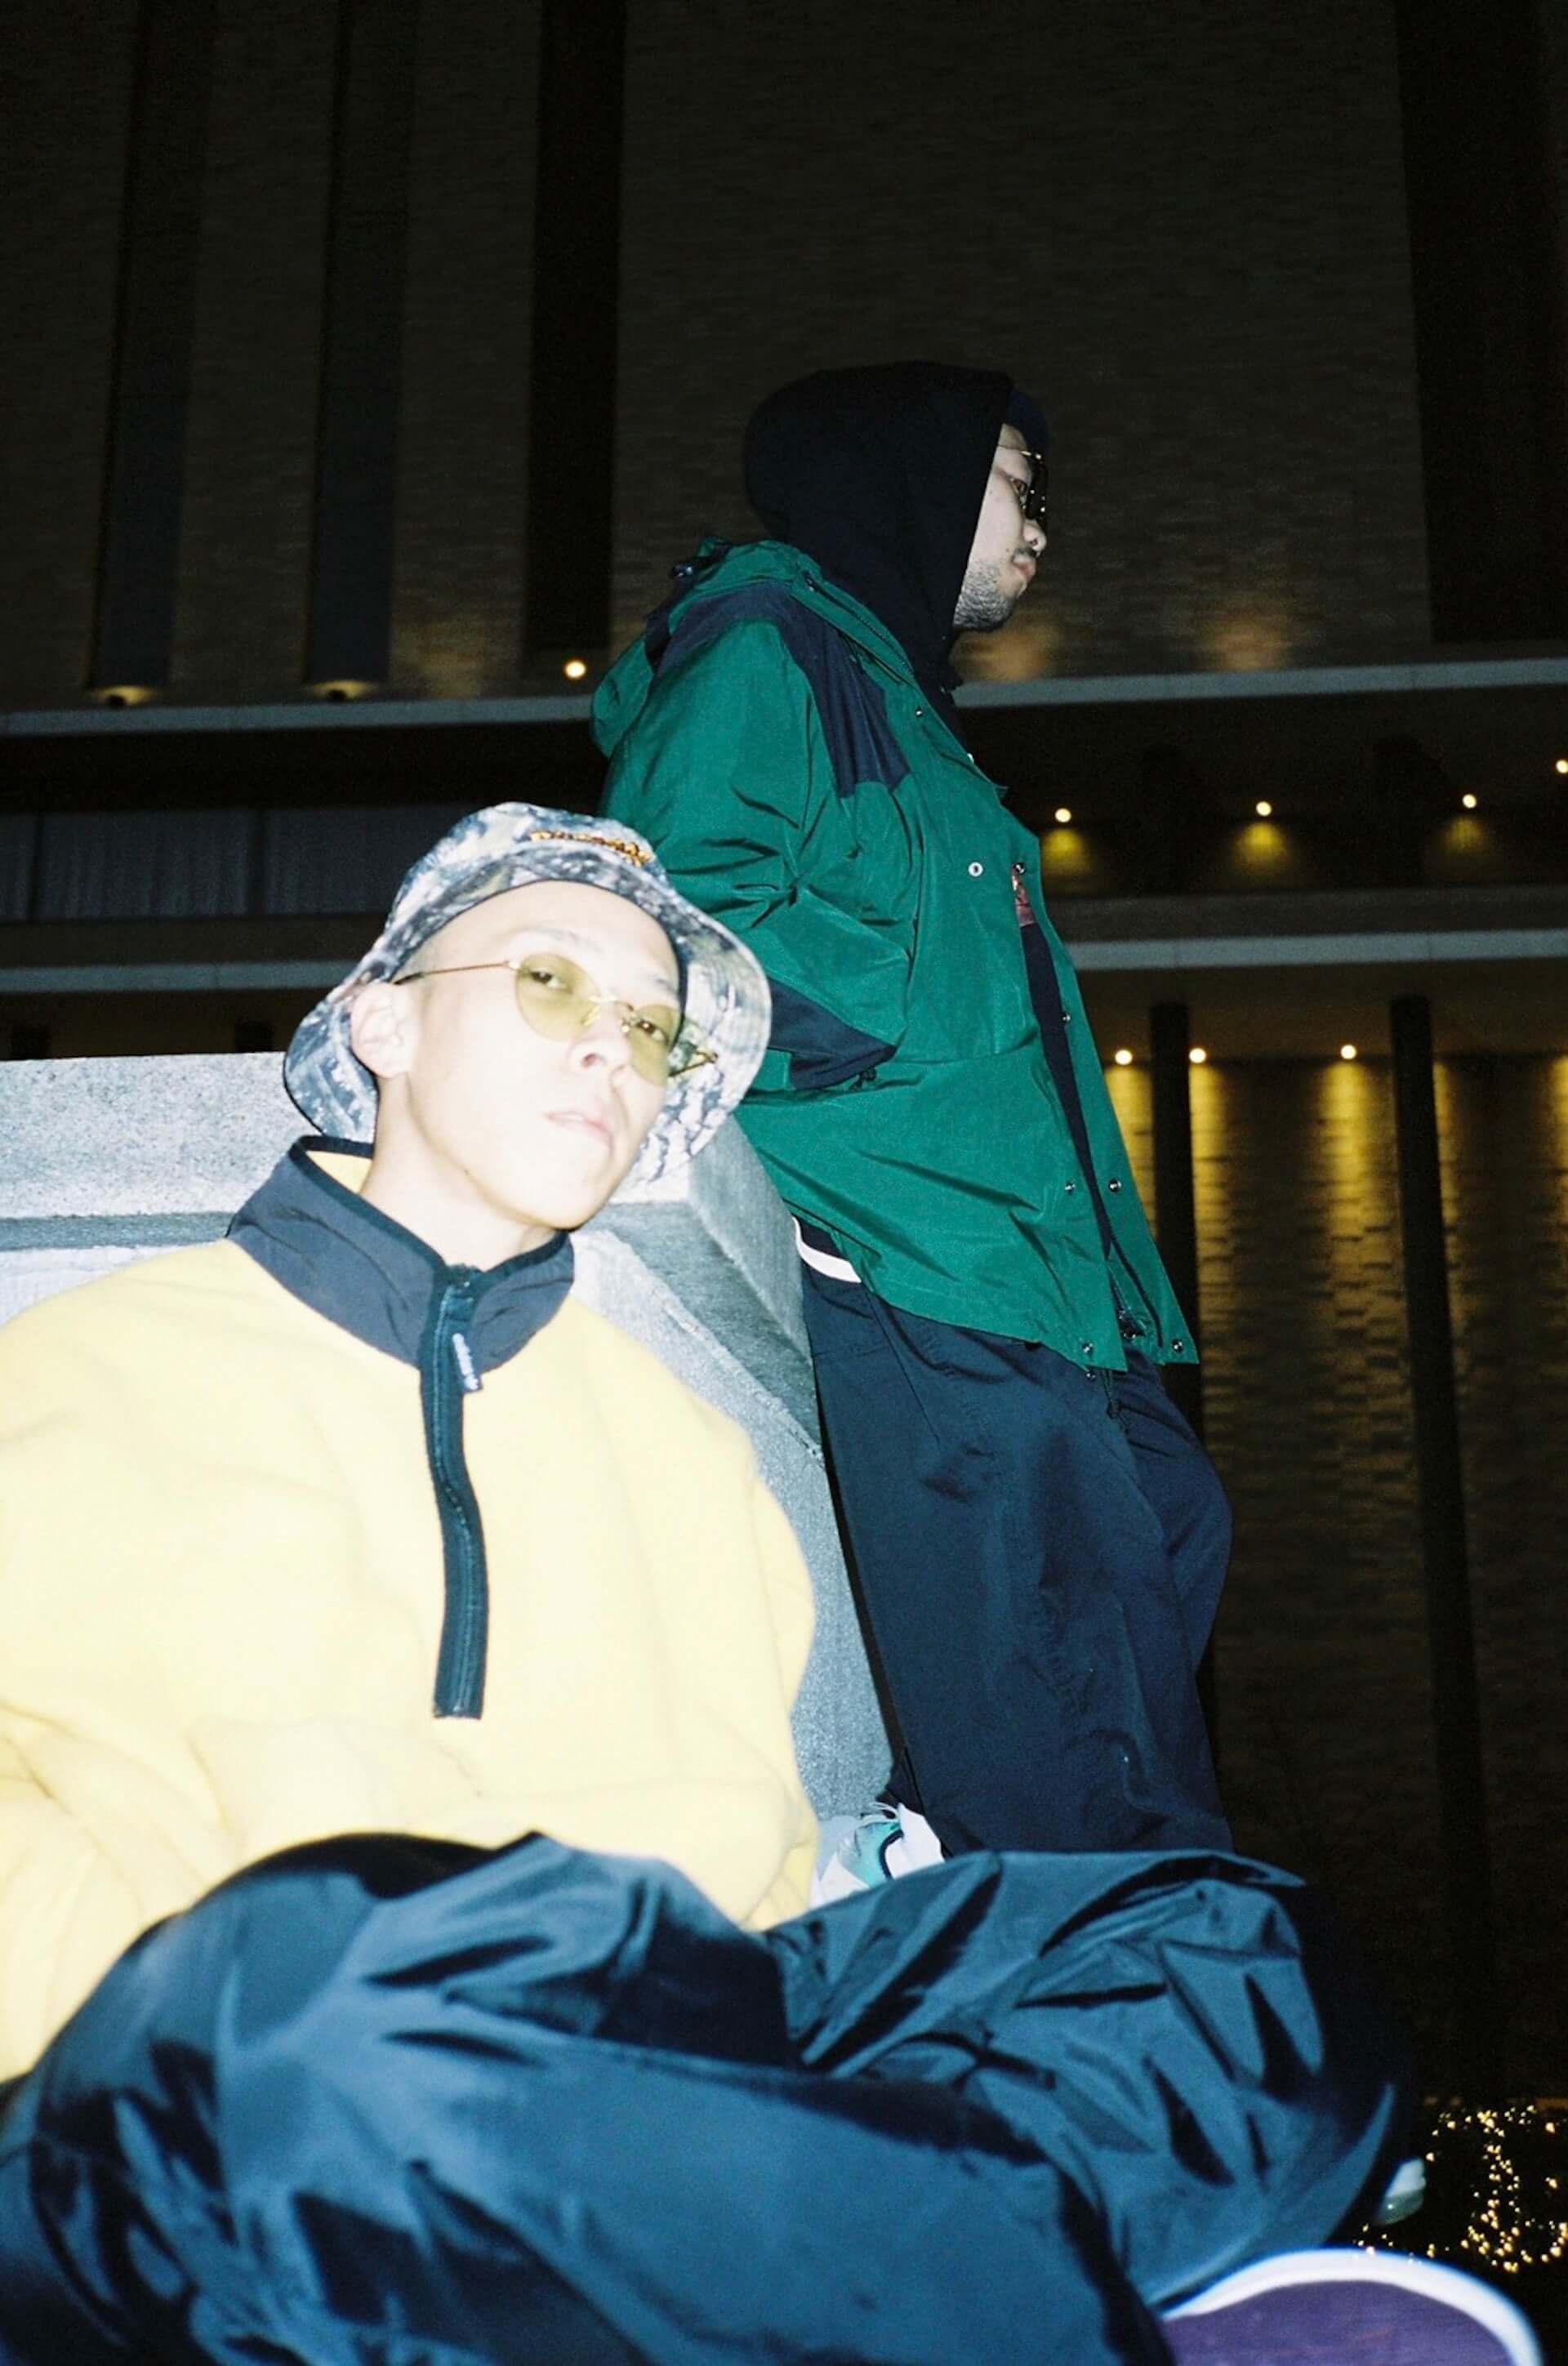 SILENT KILLA JOINTとdhrmaによるジョイントアルバム『DAWN』がリリース決定!MU-TON、BES、MILES WORD、rkemishiらが参加 music210129_silent-killa-joint_2-1920x2897